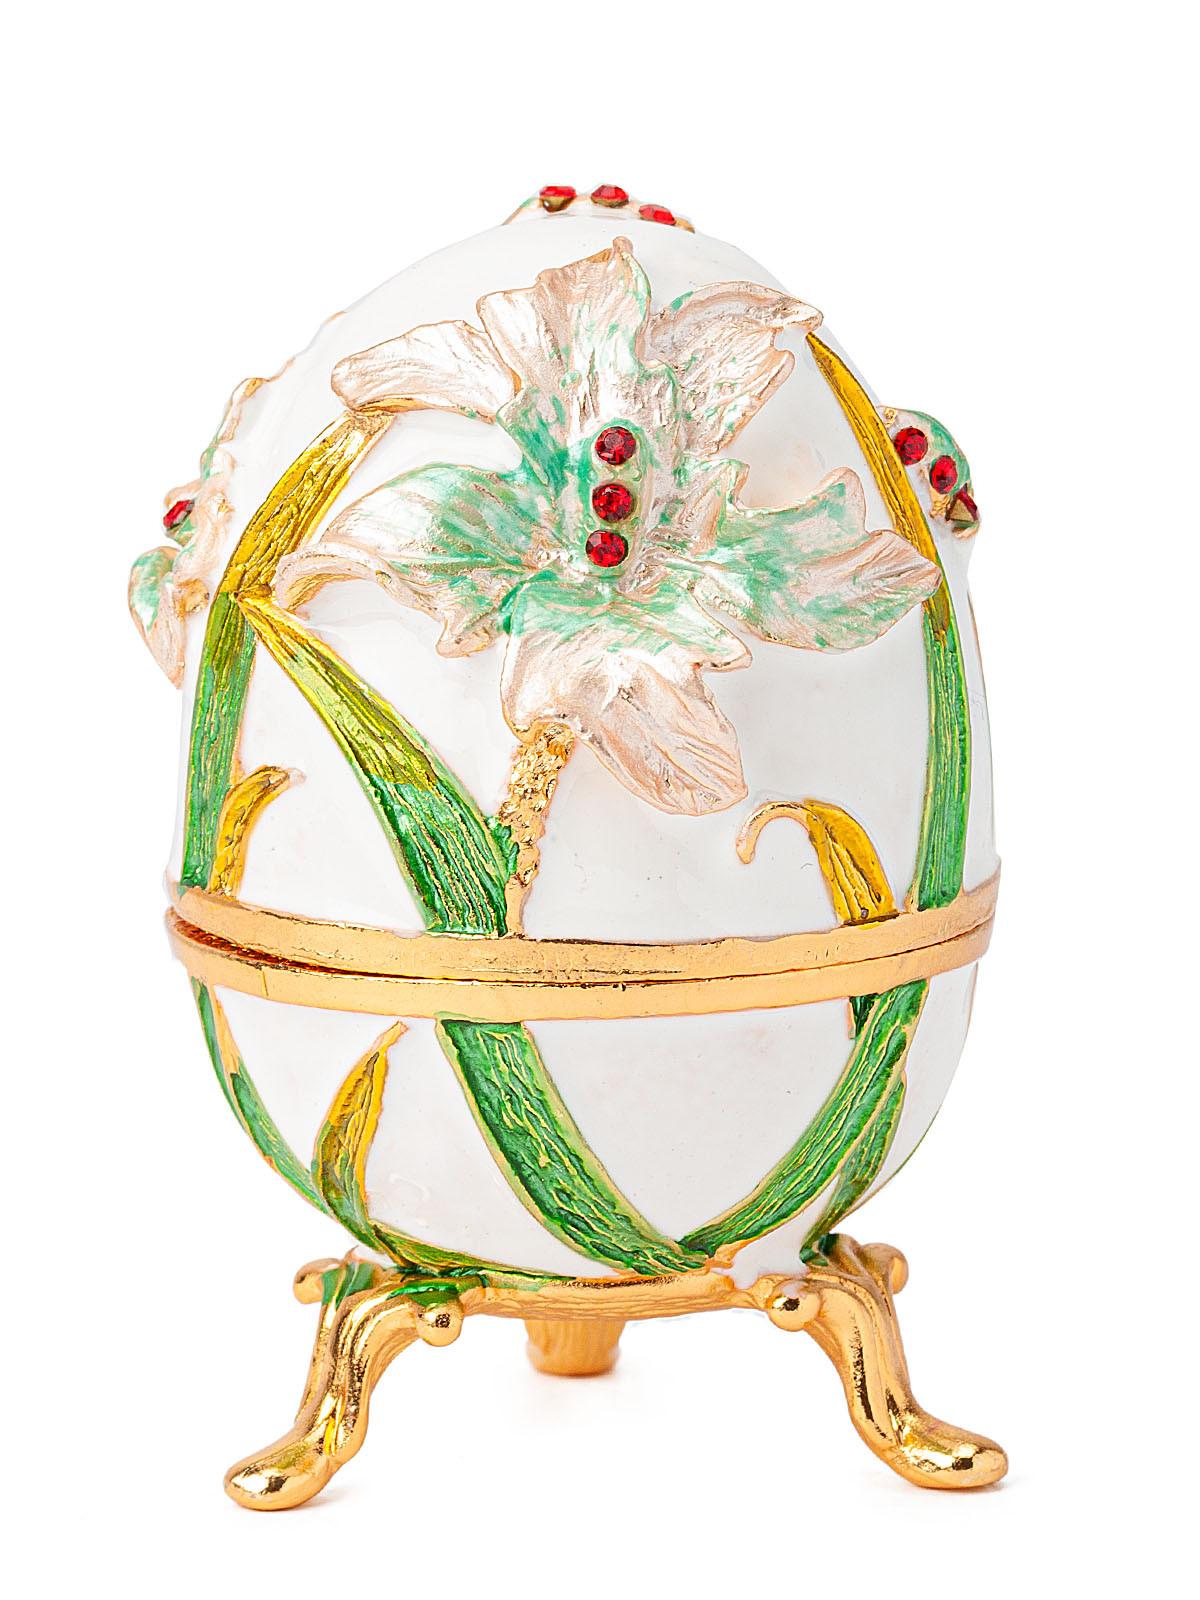 Шкатулка для украшений Яйцо Фаберже S-1524 белый